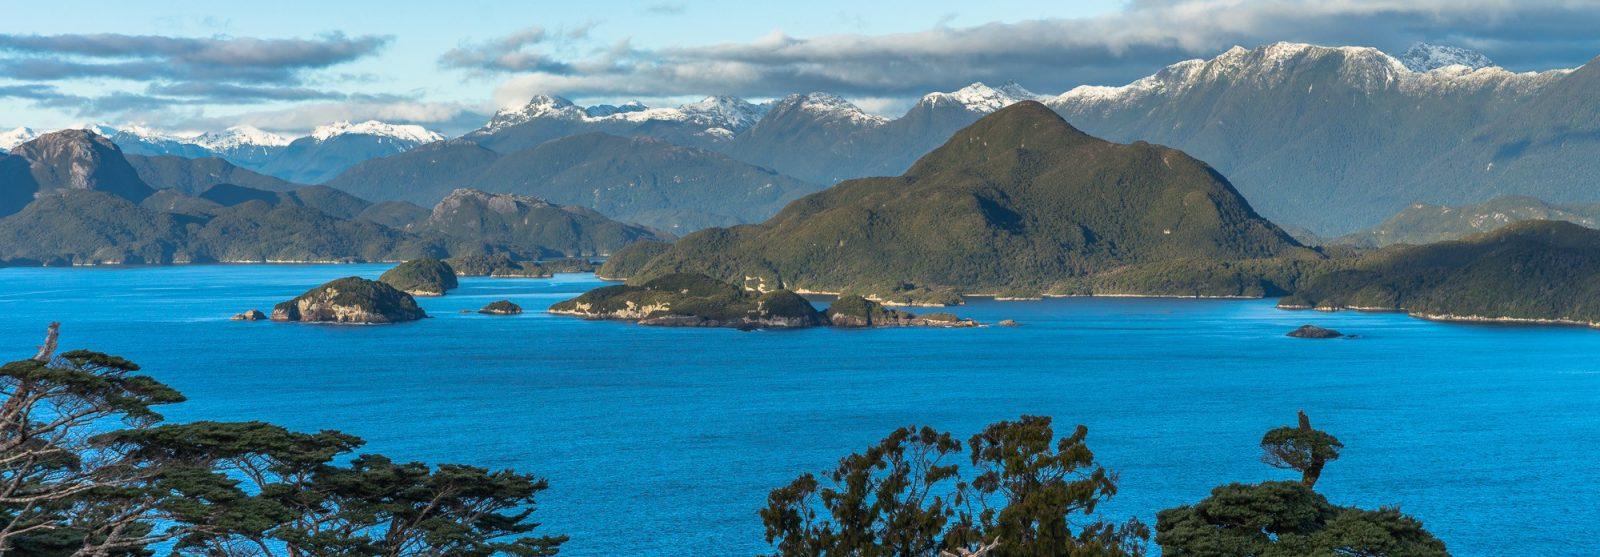 Dusky Sound – Fiordland